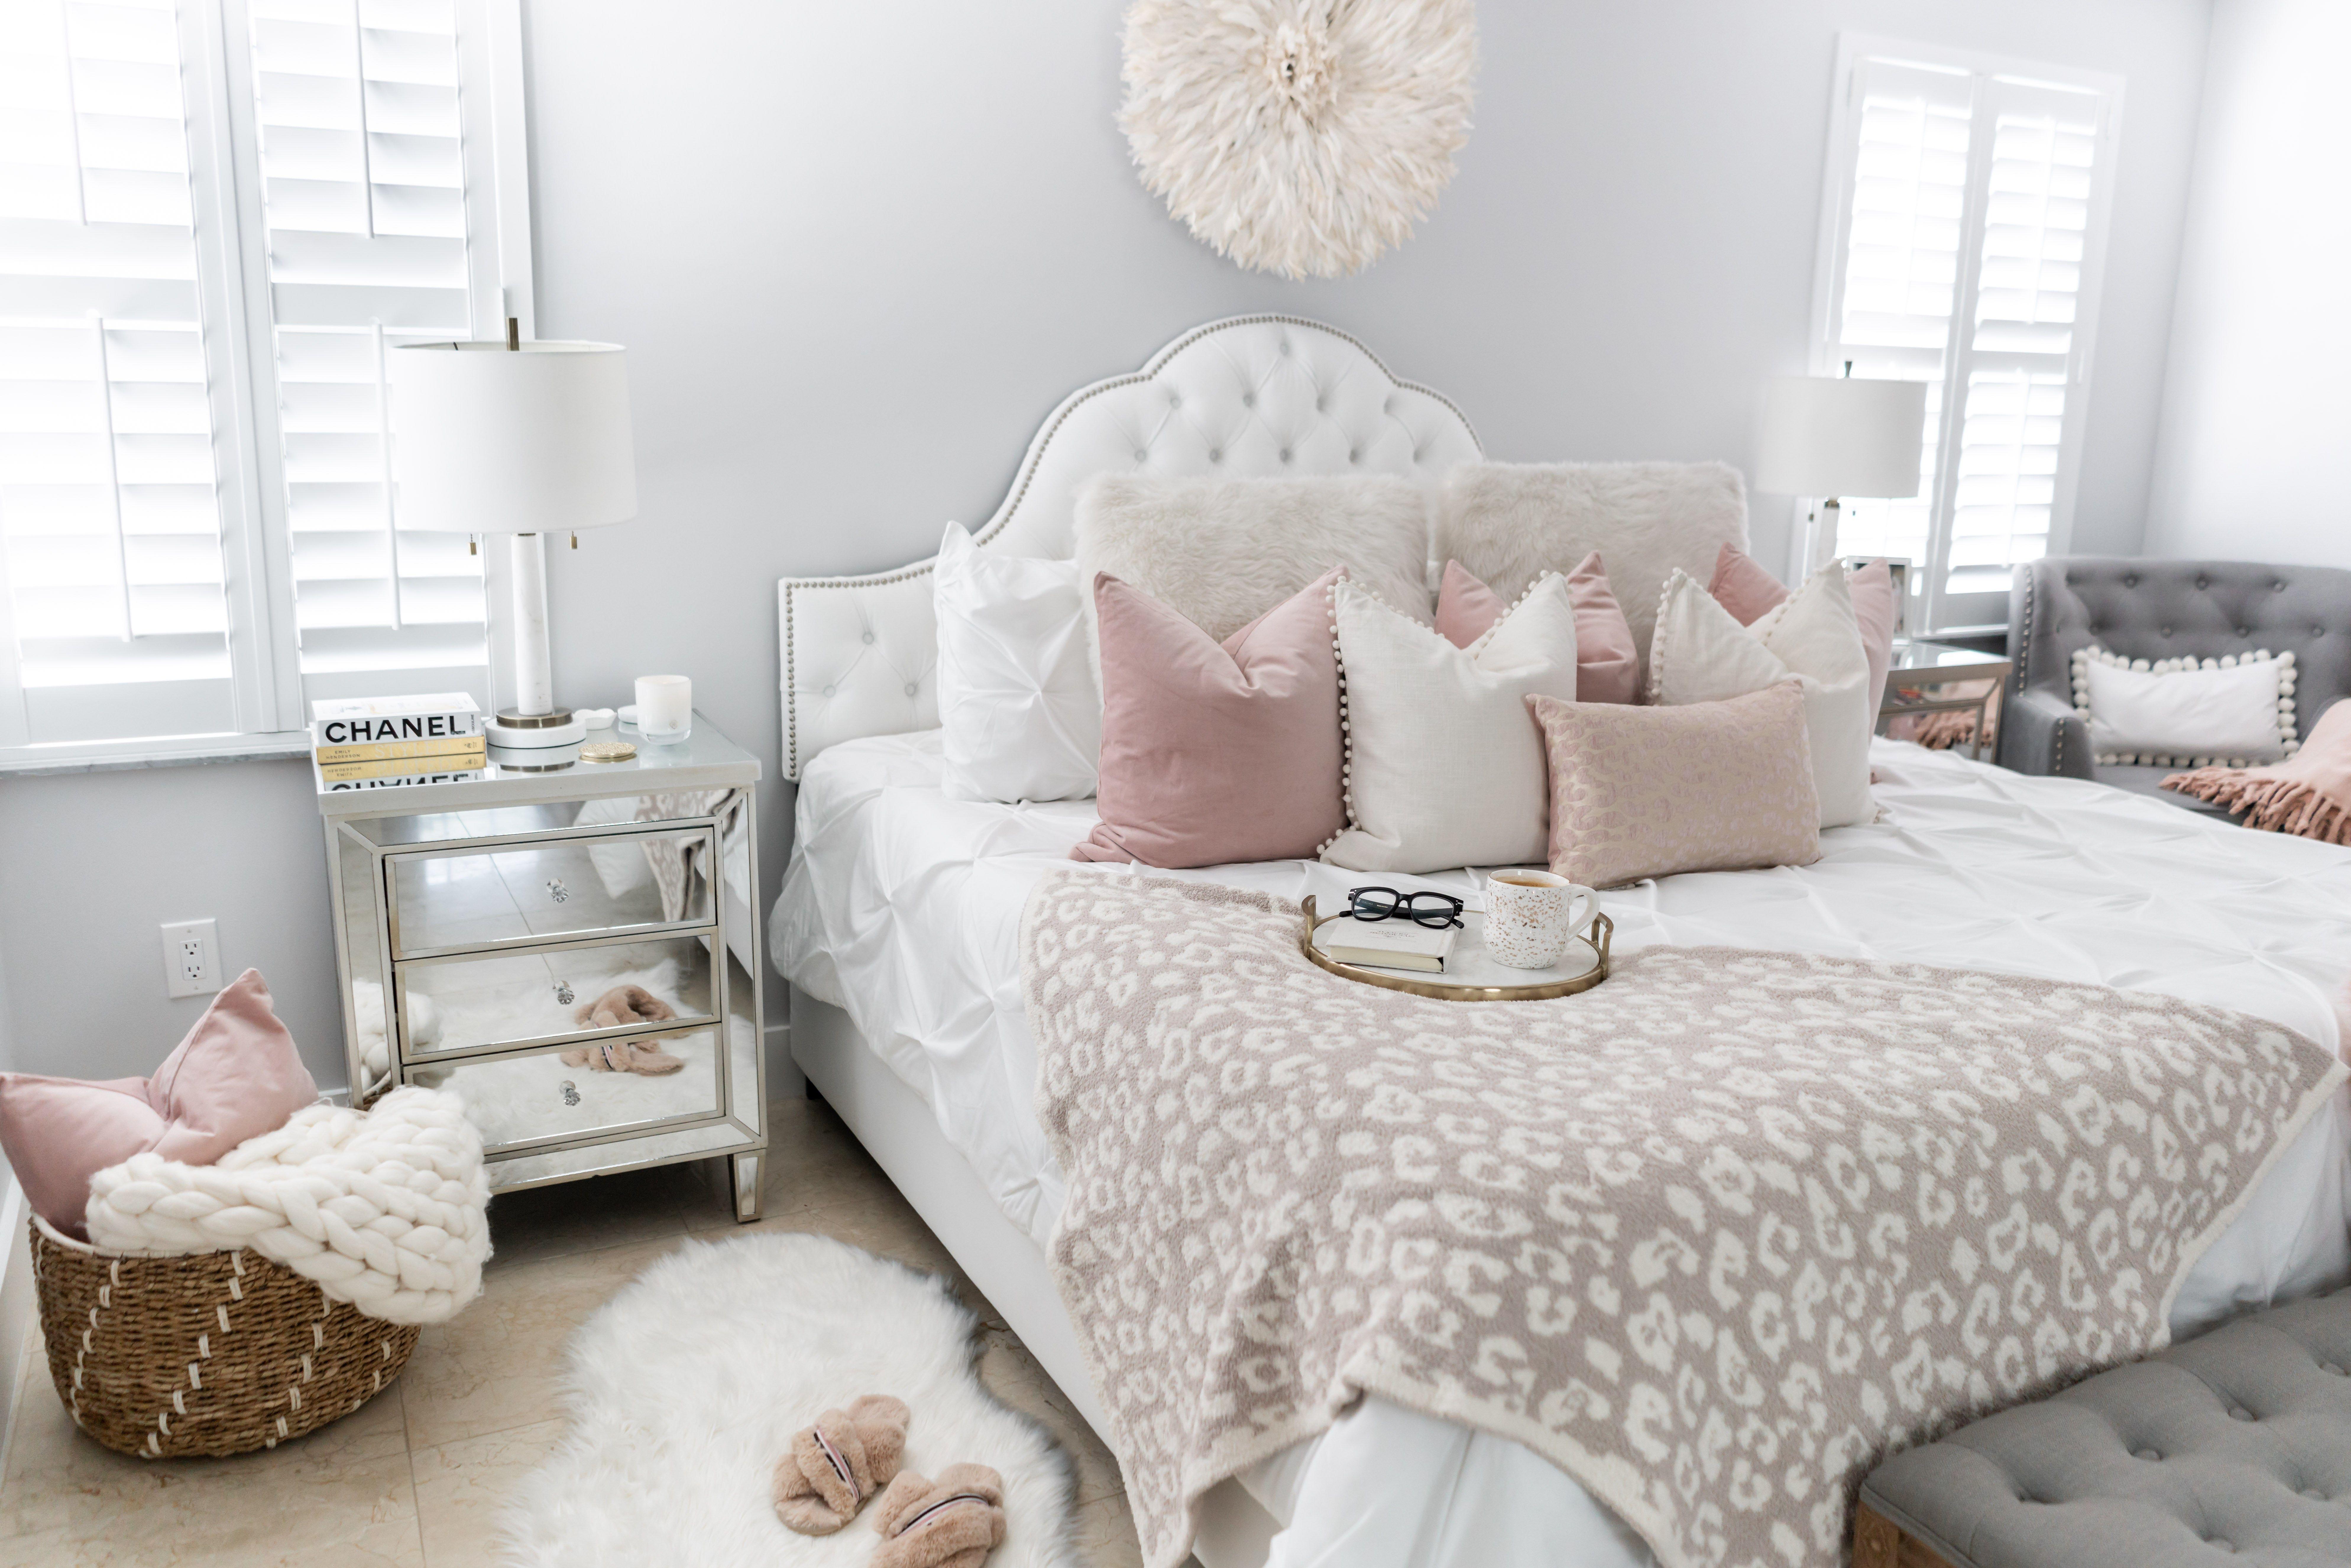 How To Make Your Bedroom Cozy Fancy bedroom, Small